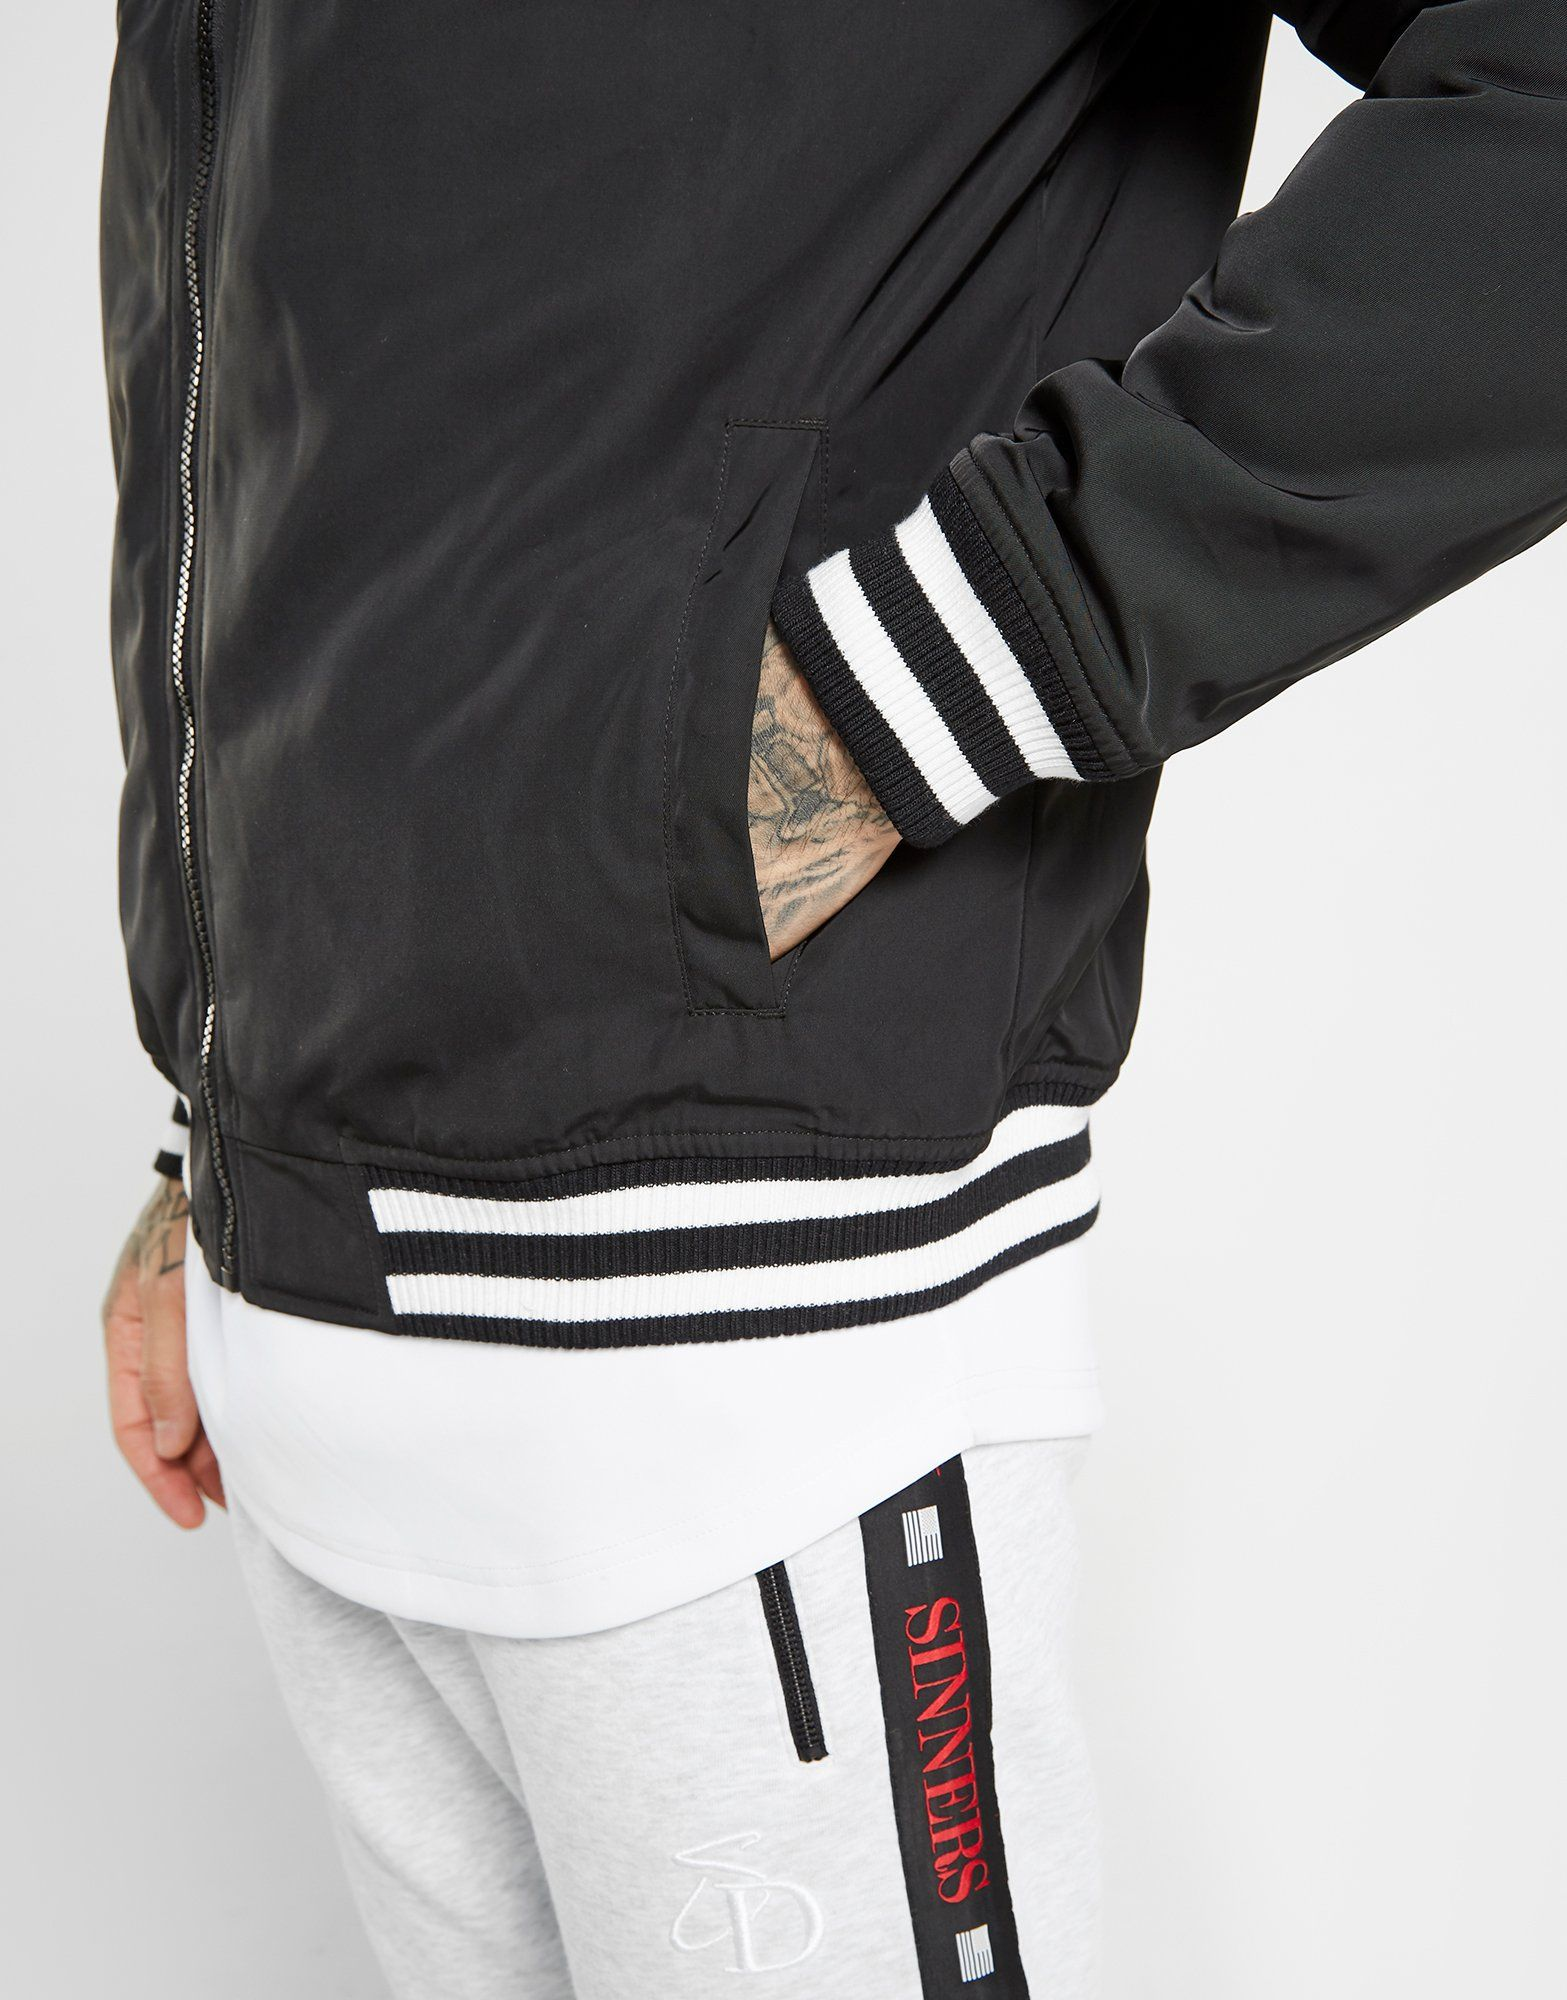 Supply & Demand Ember Jacket